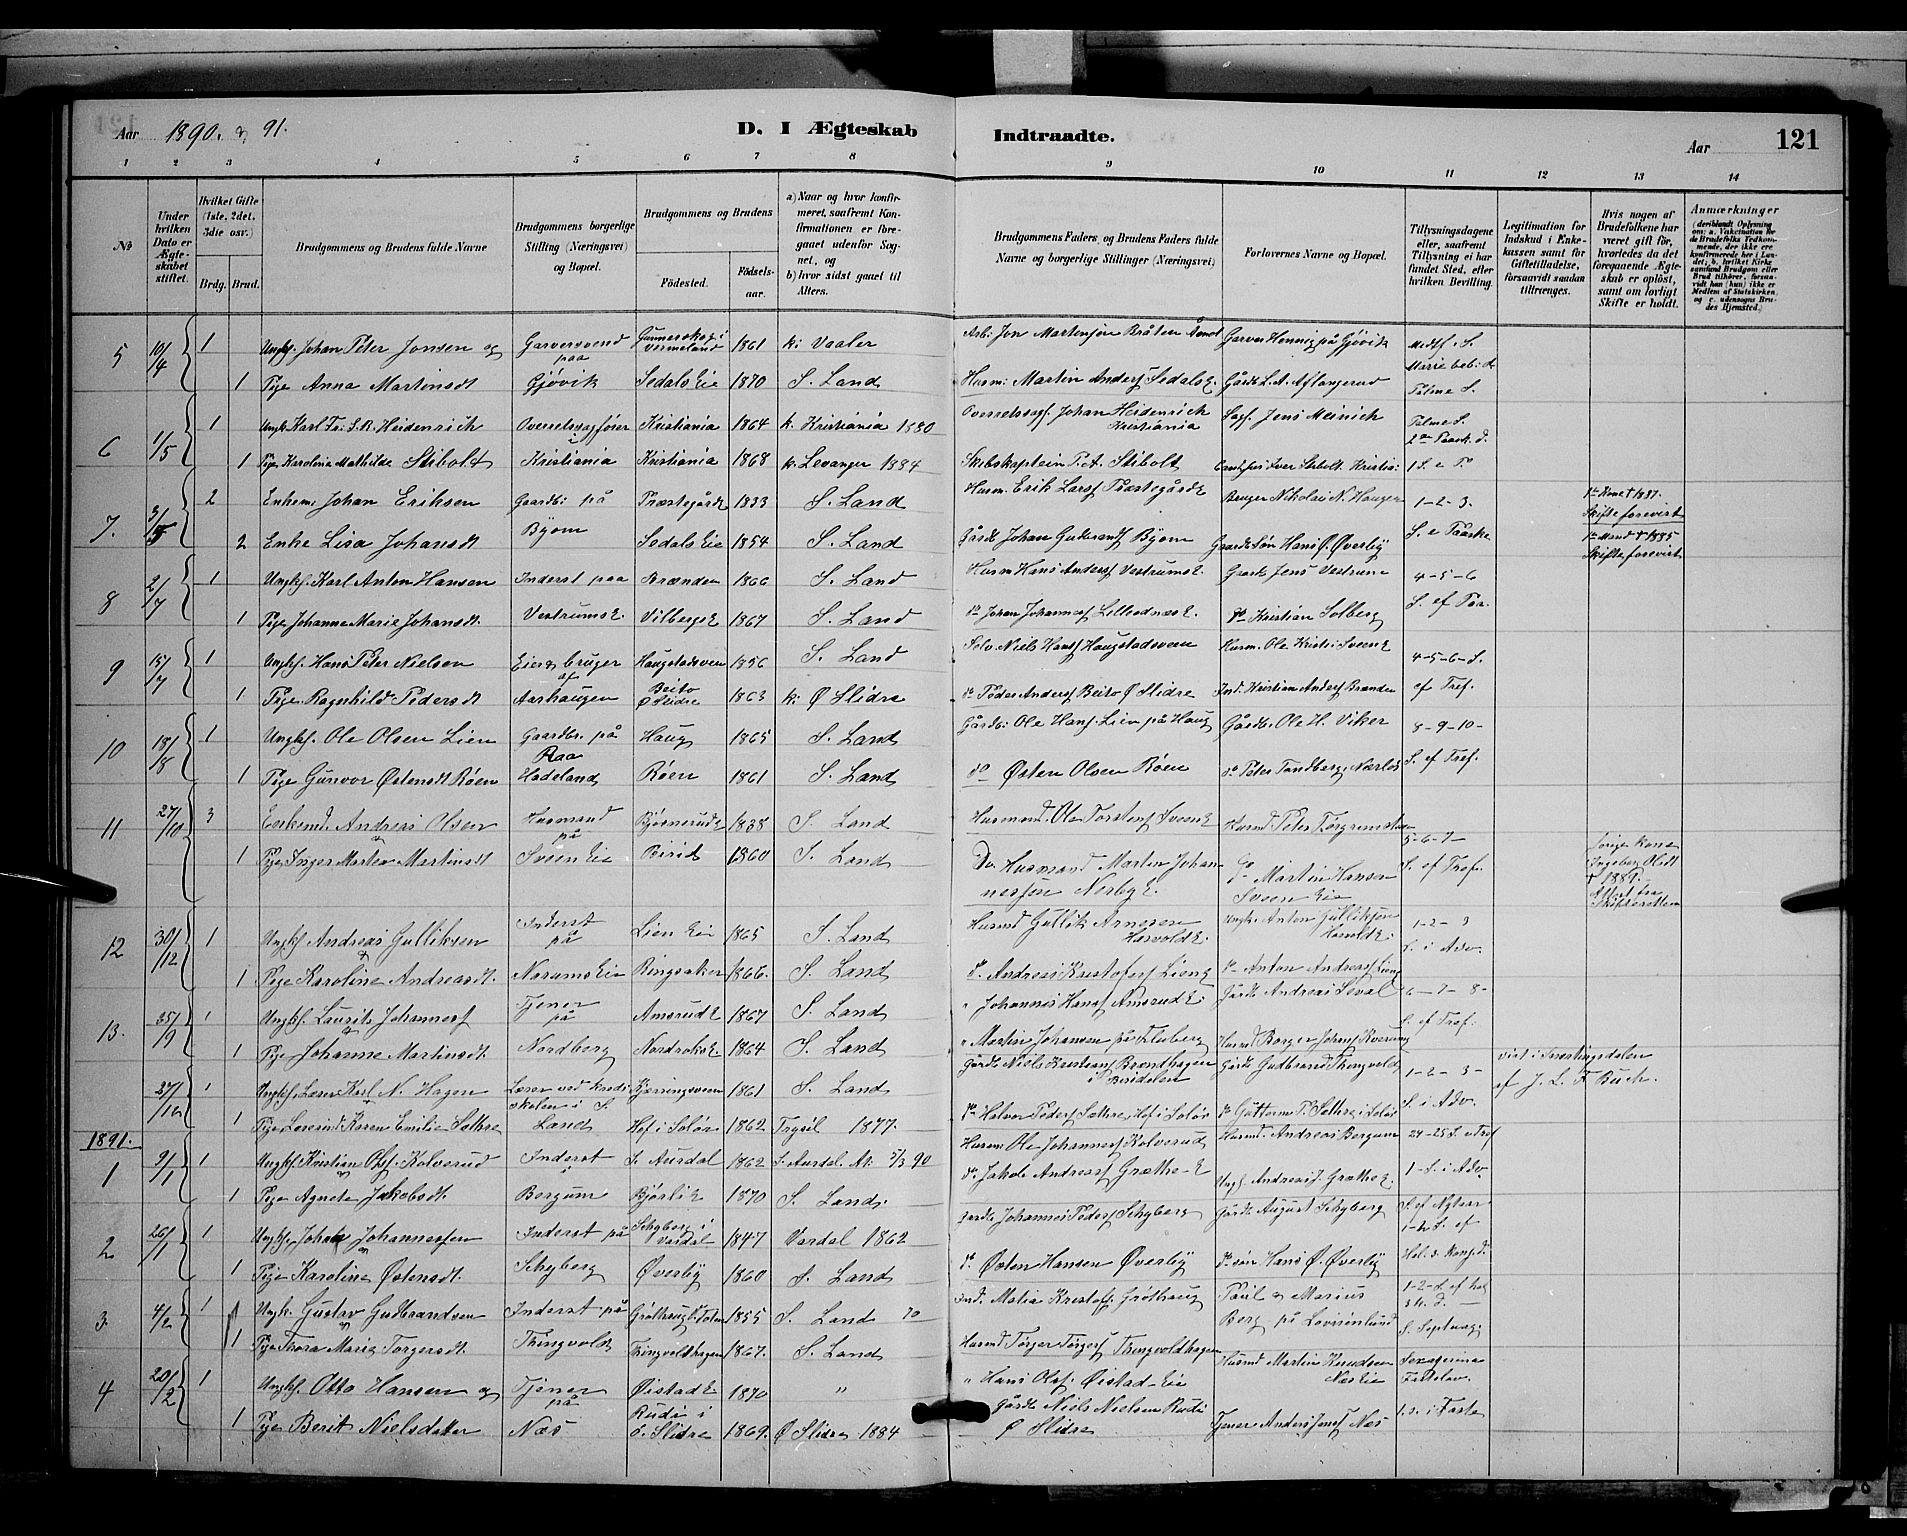 SAH, Søndre Land prestekontor, L/L0003: Klokkerbok nr. 3, 1884-1902, s. 121